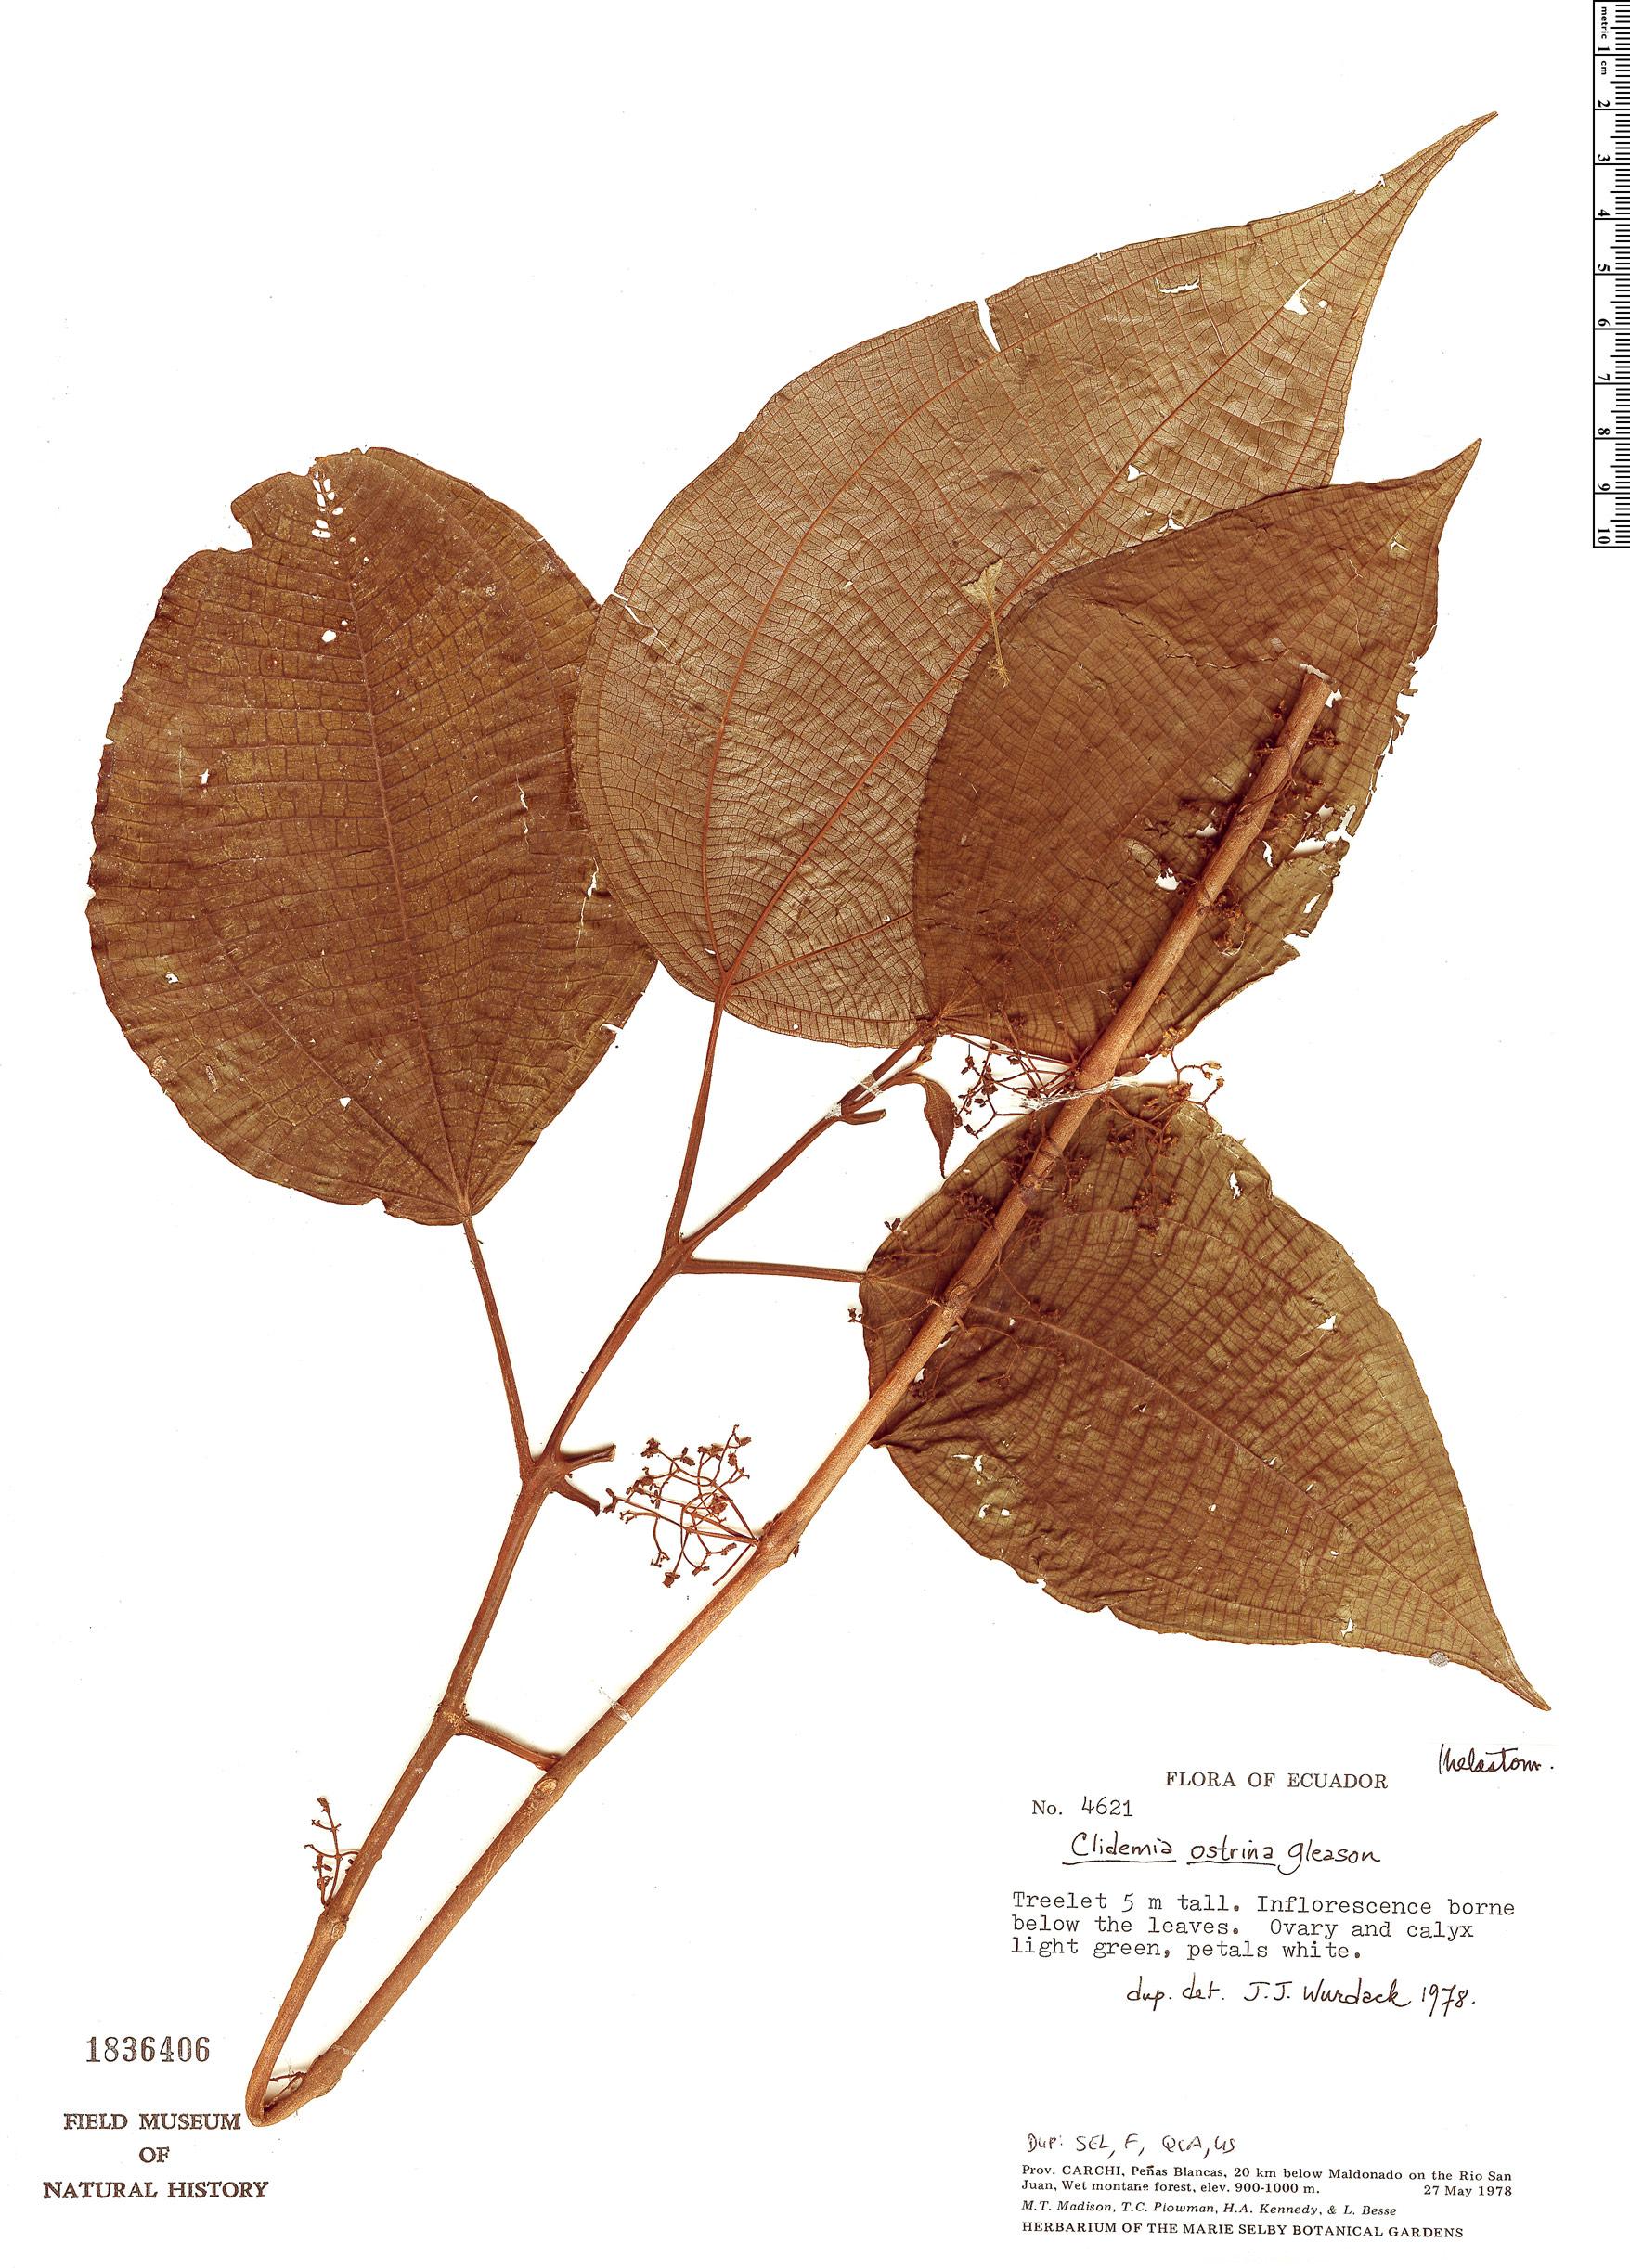 Specimen: Clidemia ostrina